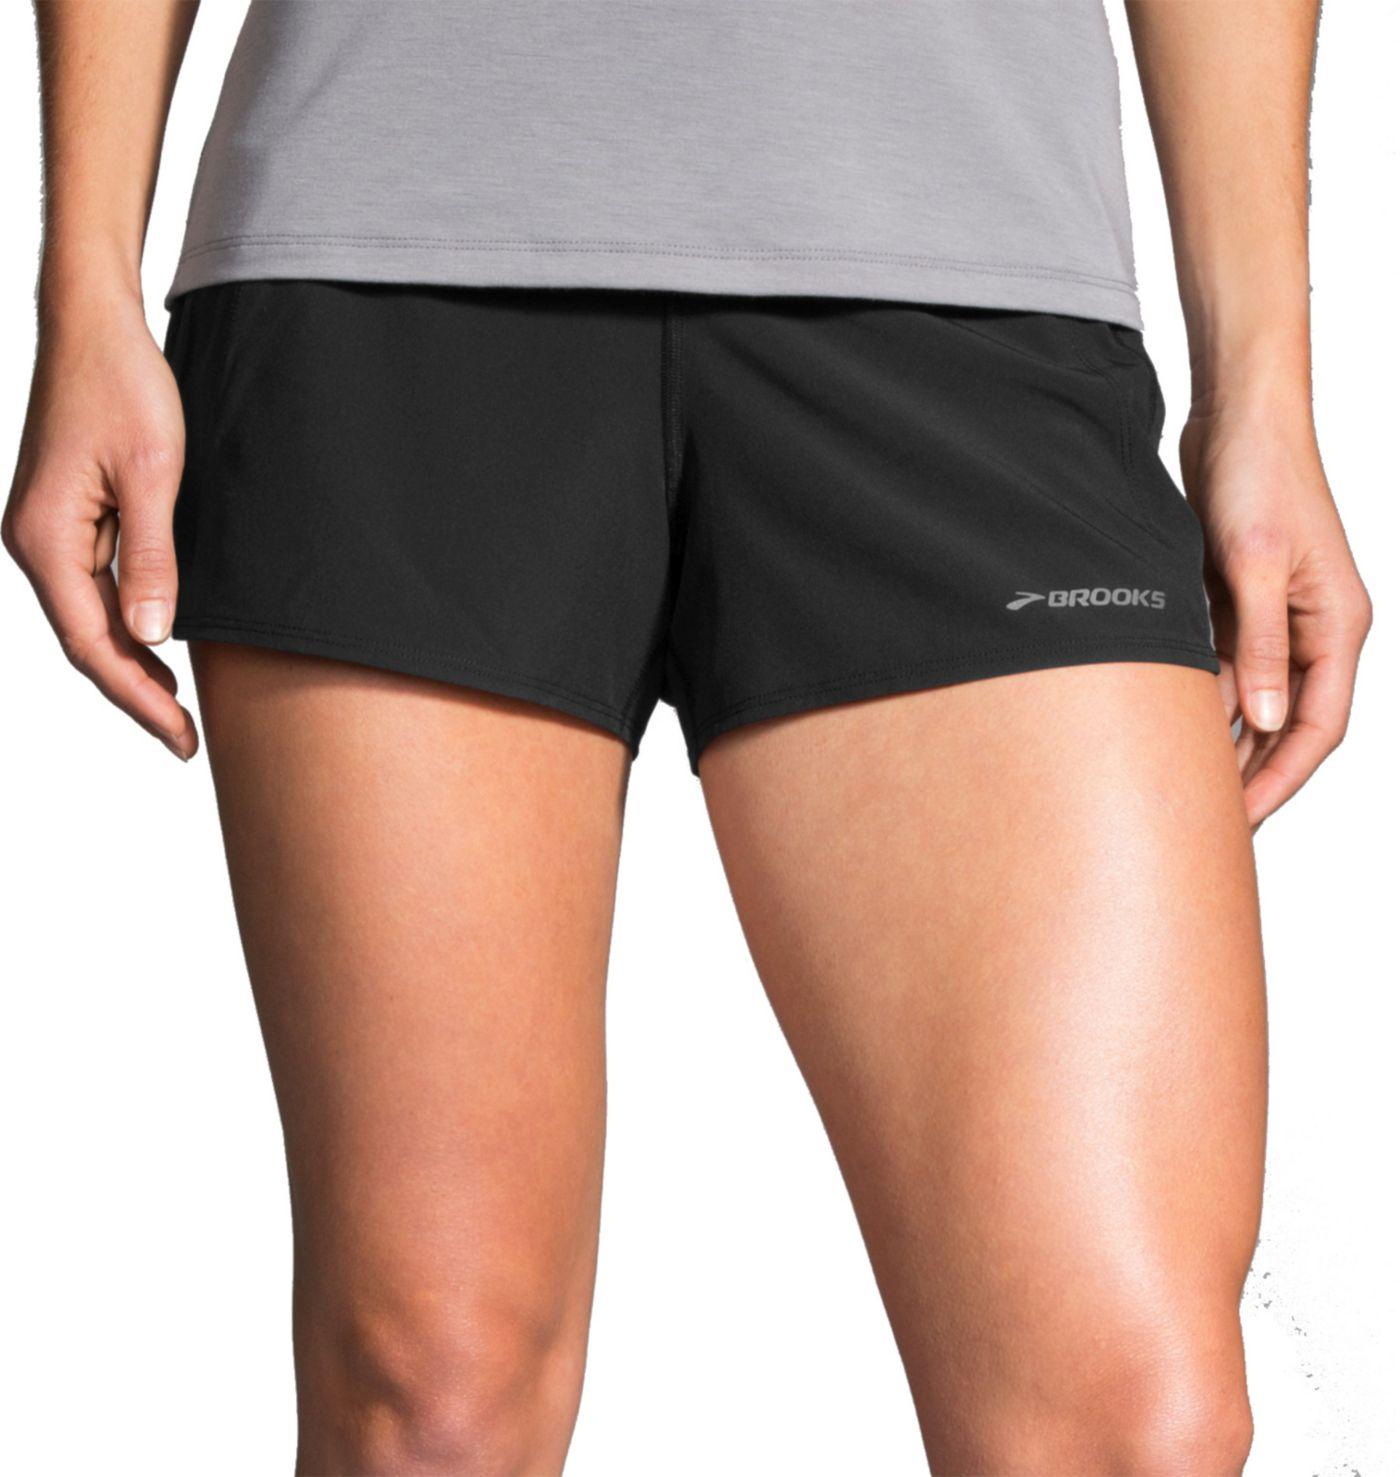 Brooks Women's Chaser 3'' Running Shorts